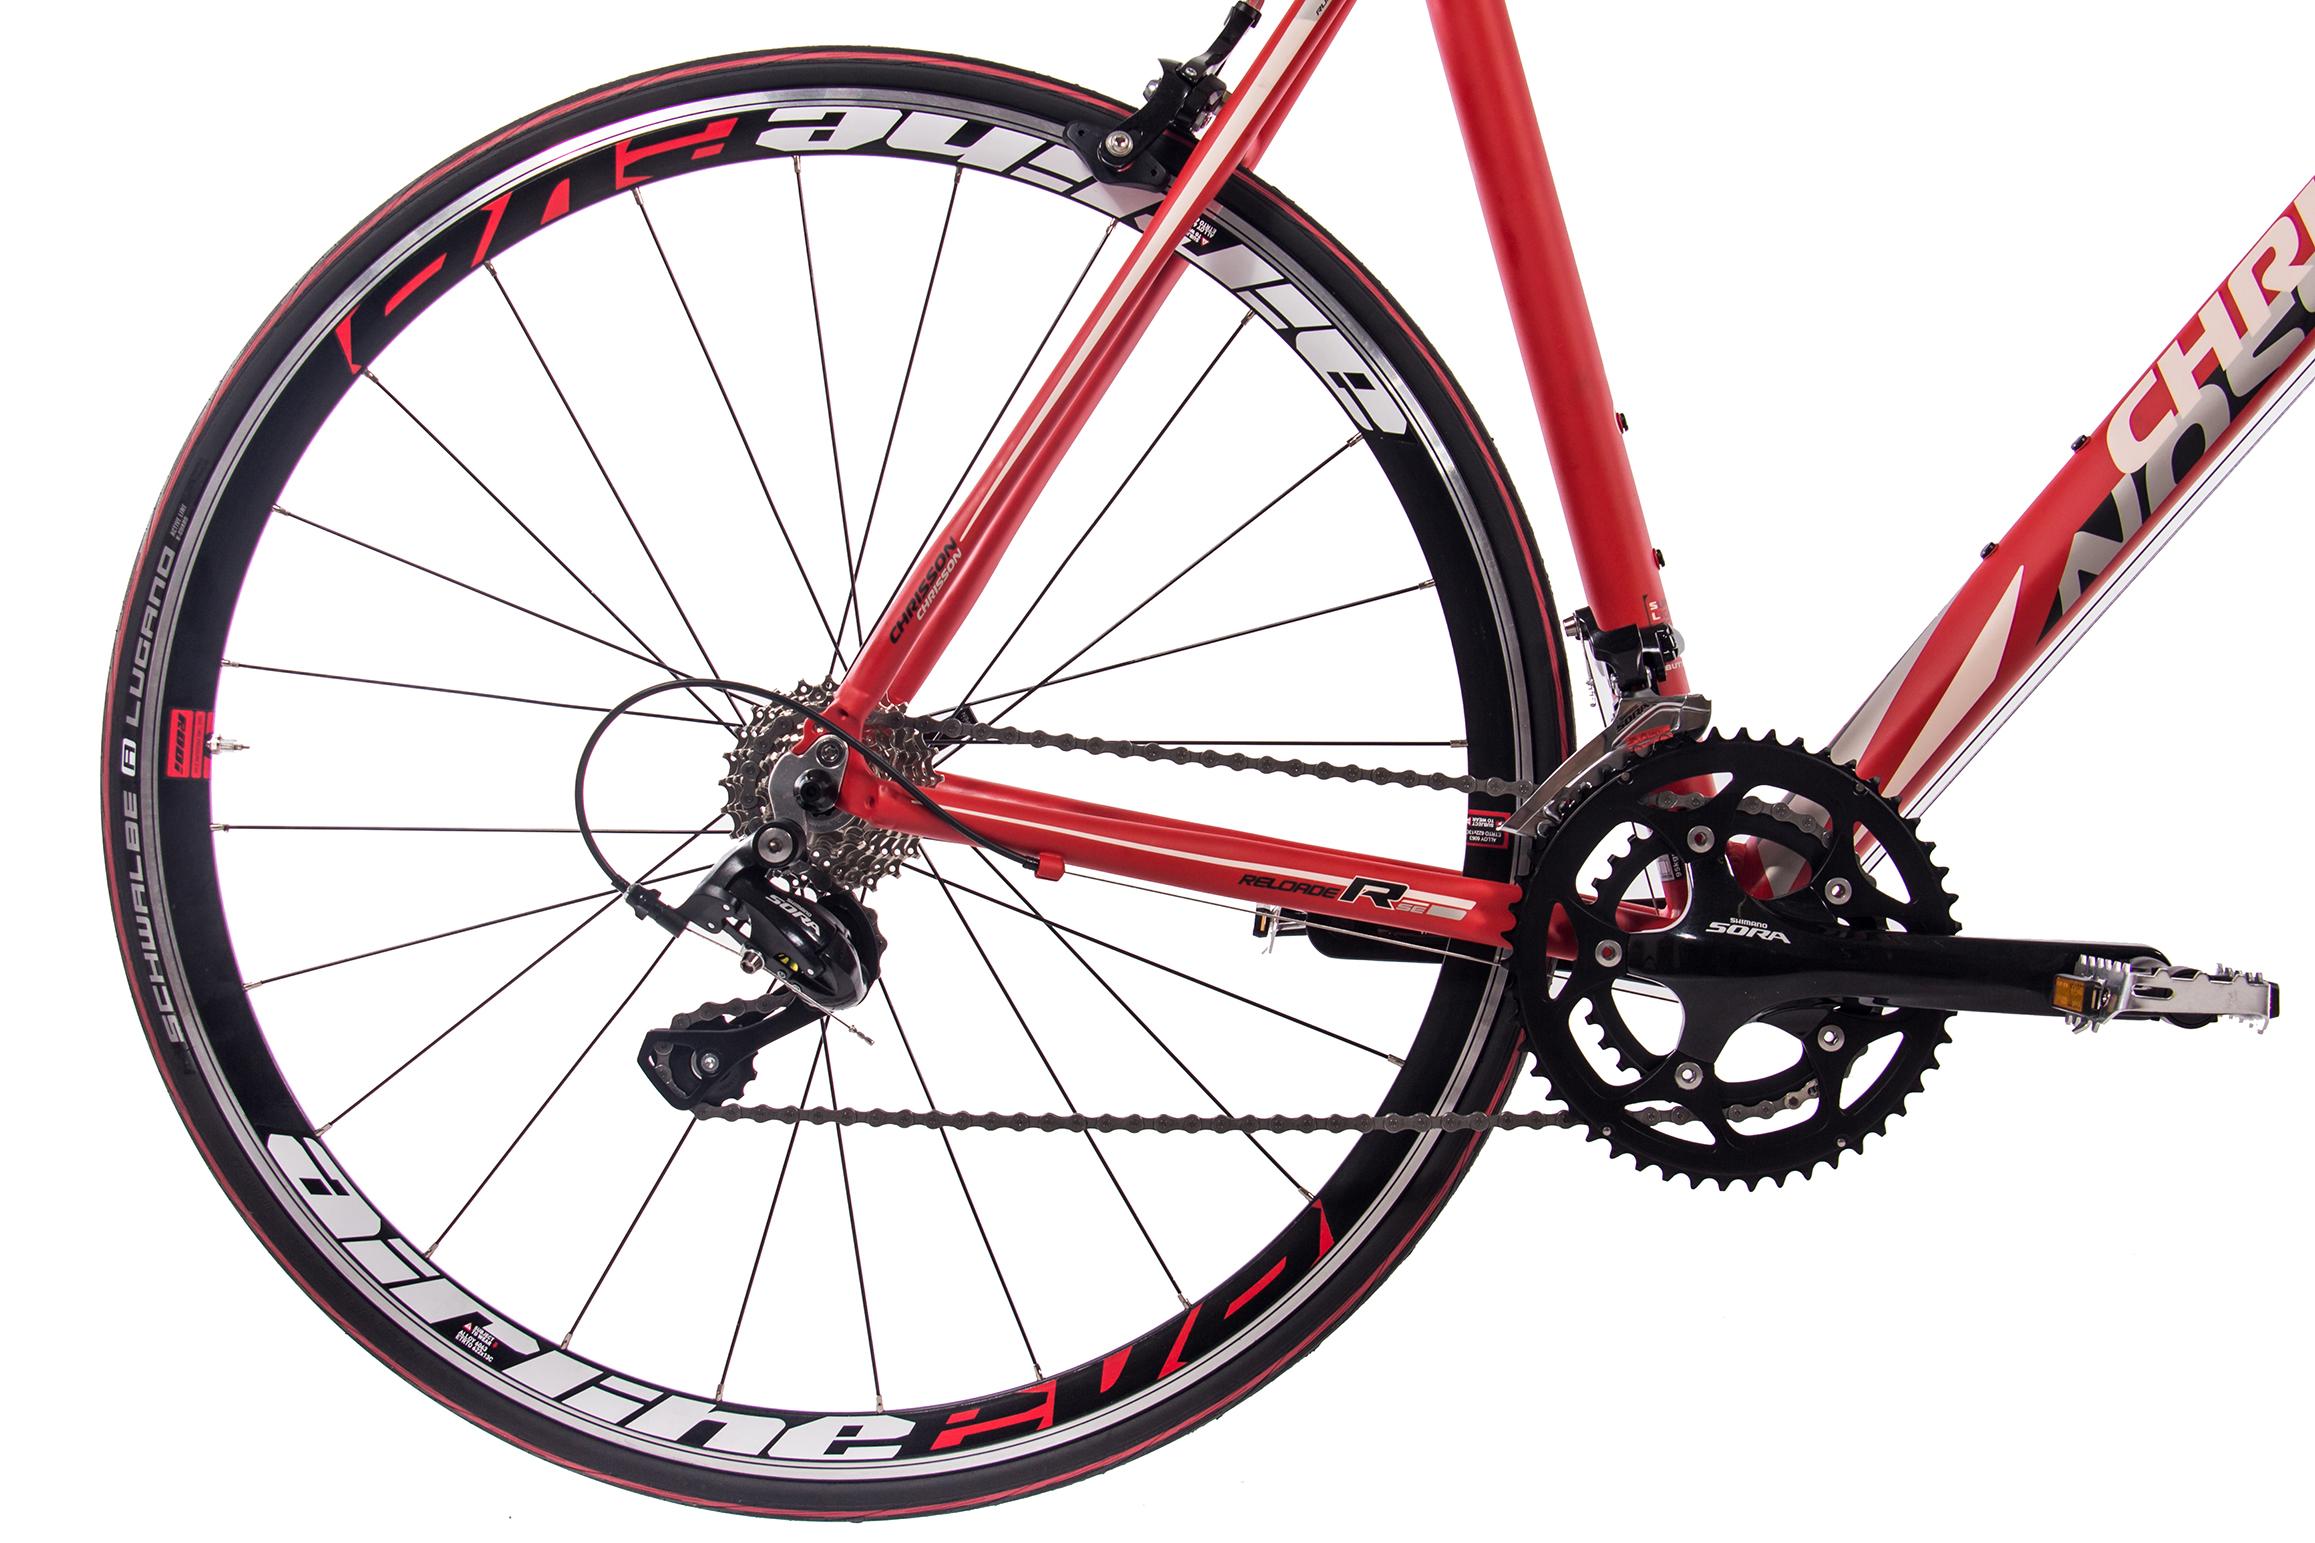 28-034-Zoll-ALU-Rennrad-Fahrrad-CHRISSON-RELOADER-mit-18G-SORA-CARBONGABEL-rot Indexbild 24